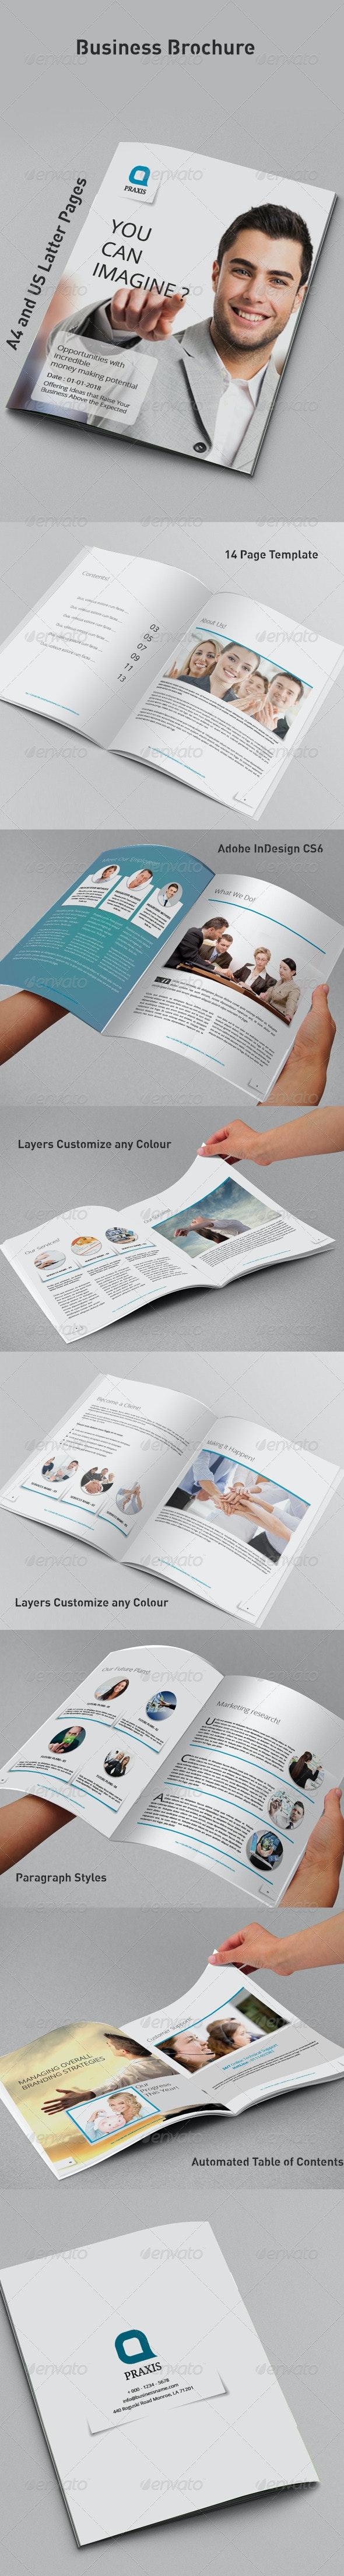 Business Brochure - Brochures Print Templates